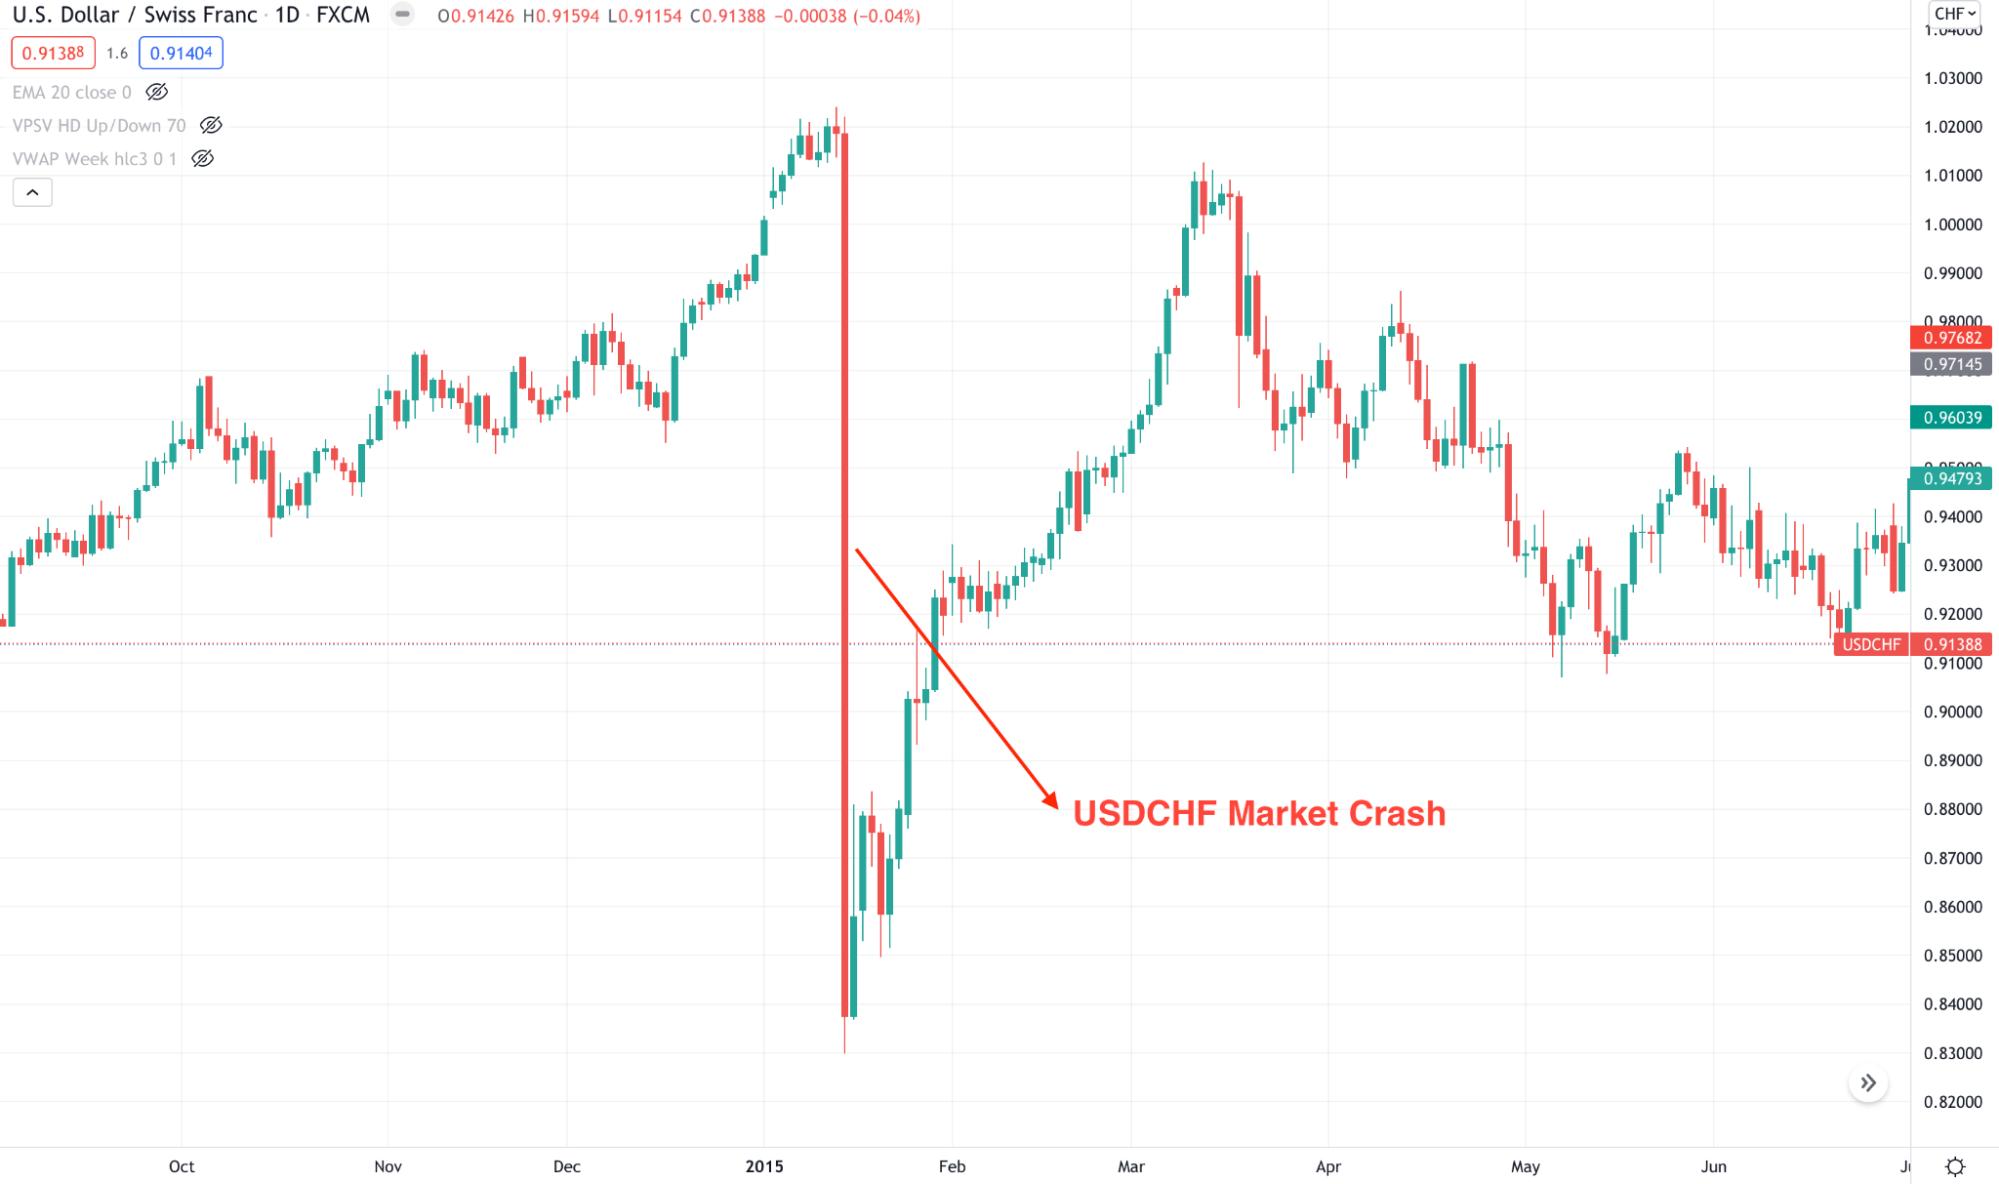 USD/CHF market crash